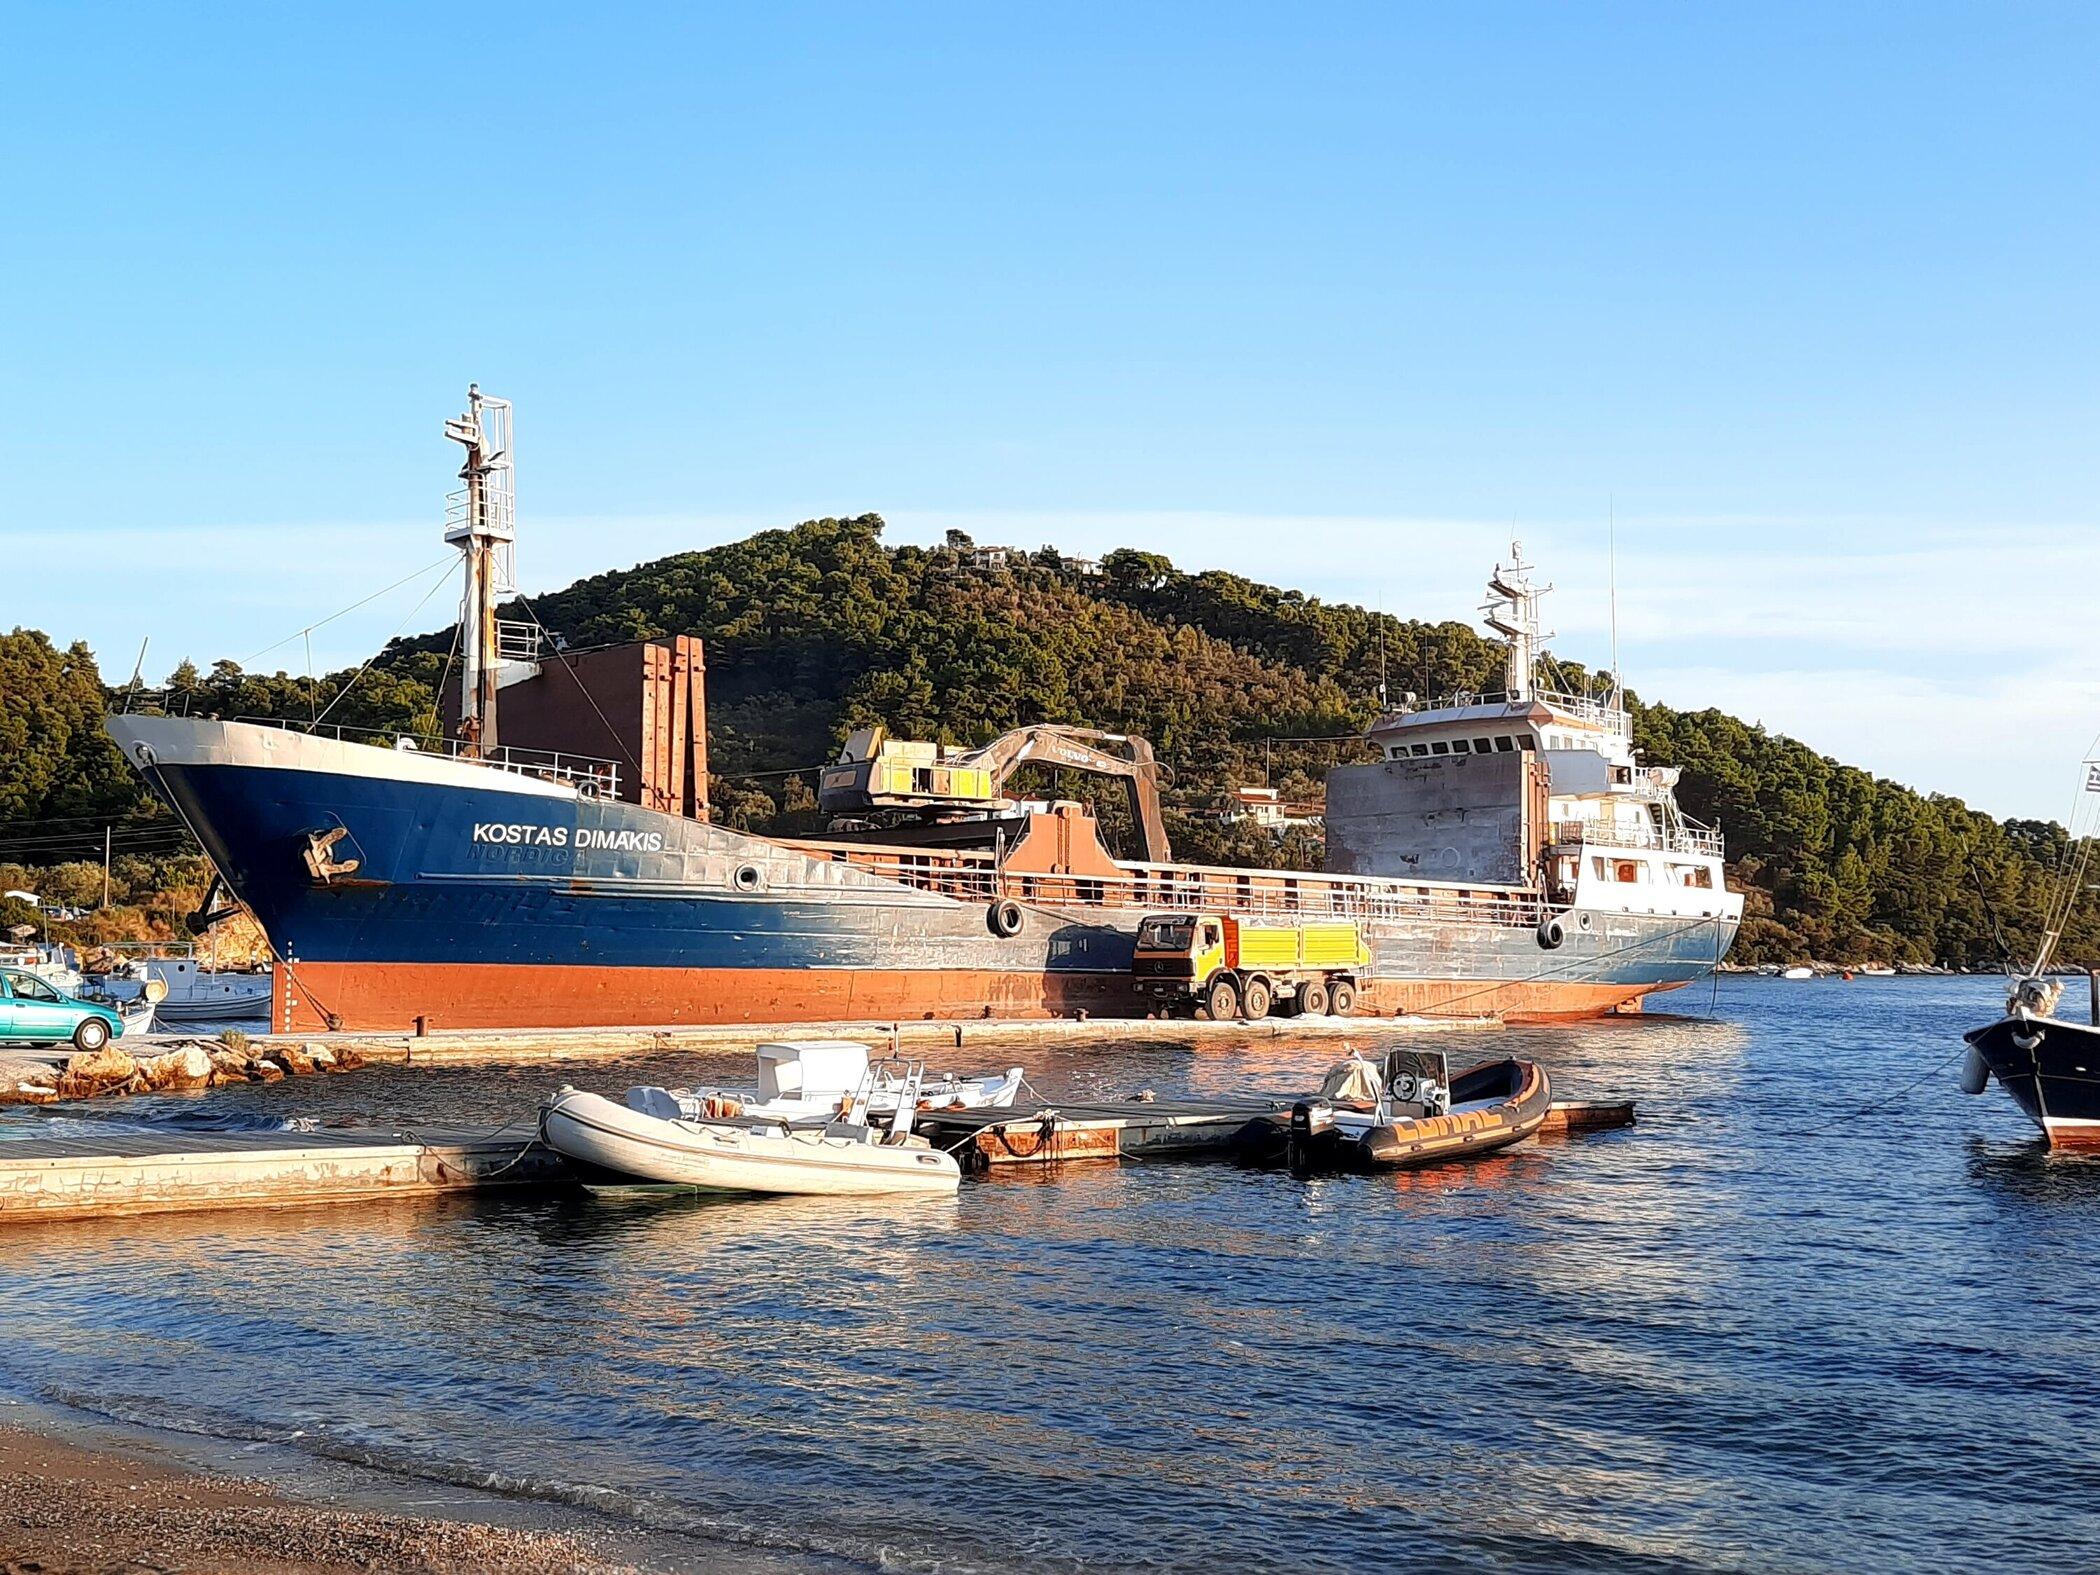 Docked at Agios Georgios (Skiathos port)